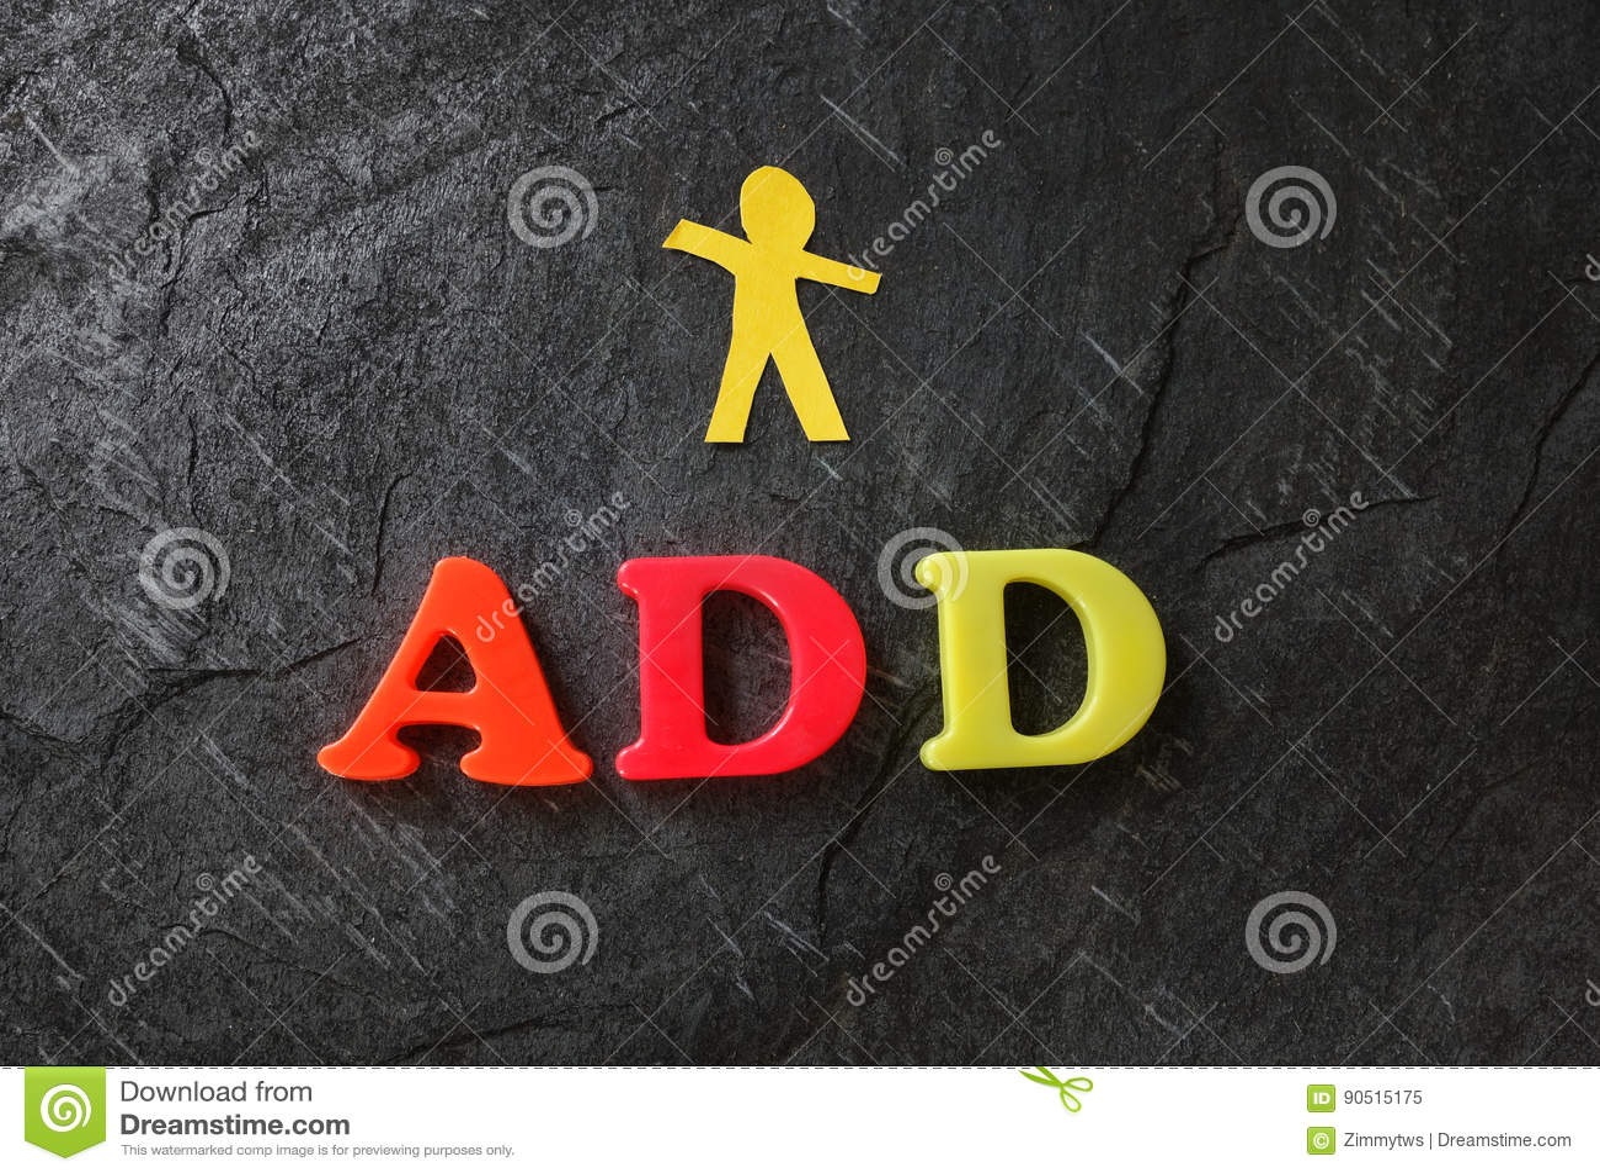 ADD paper child